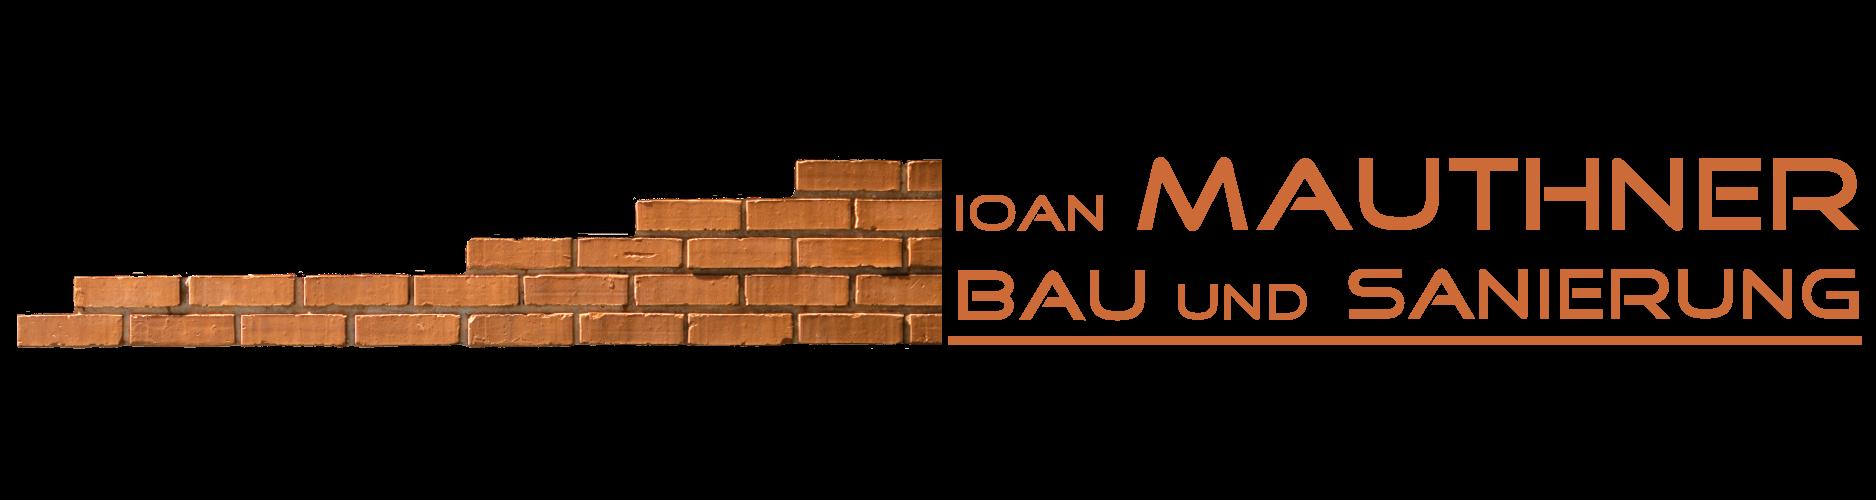 IOAN MAUTHNERBAU BAU UND SANIERUNG